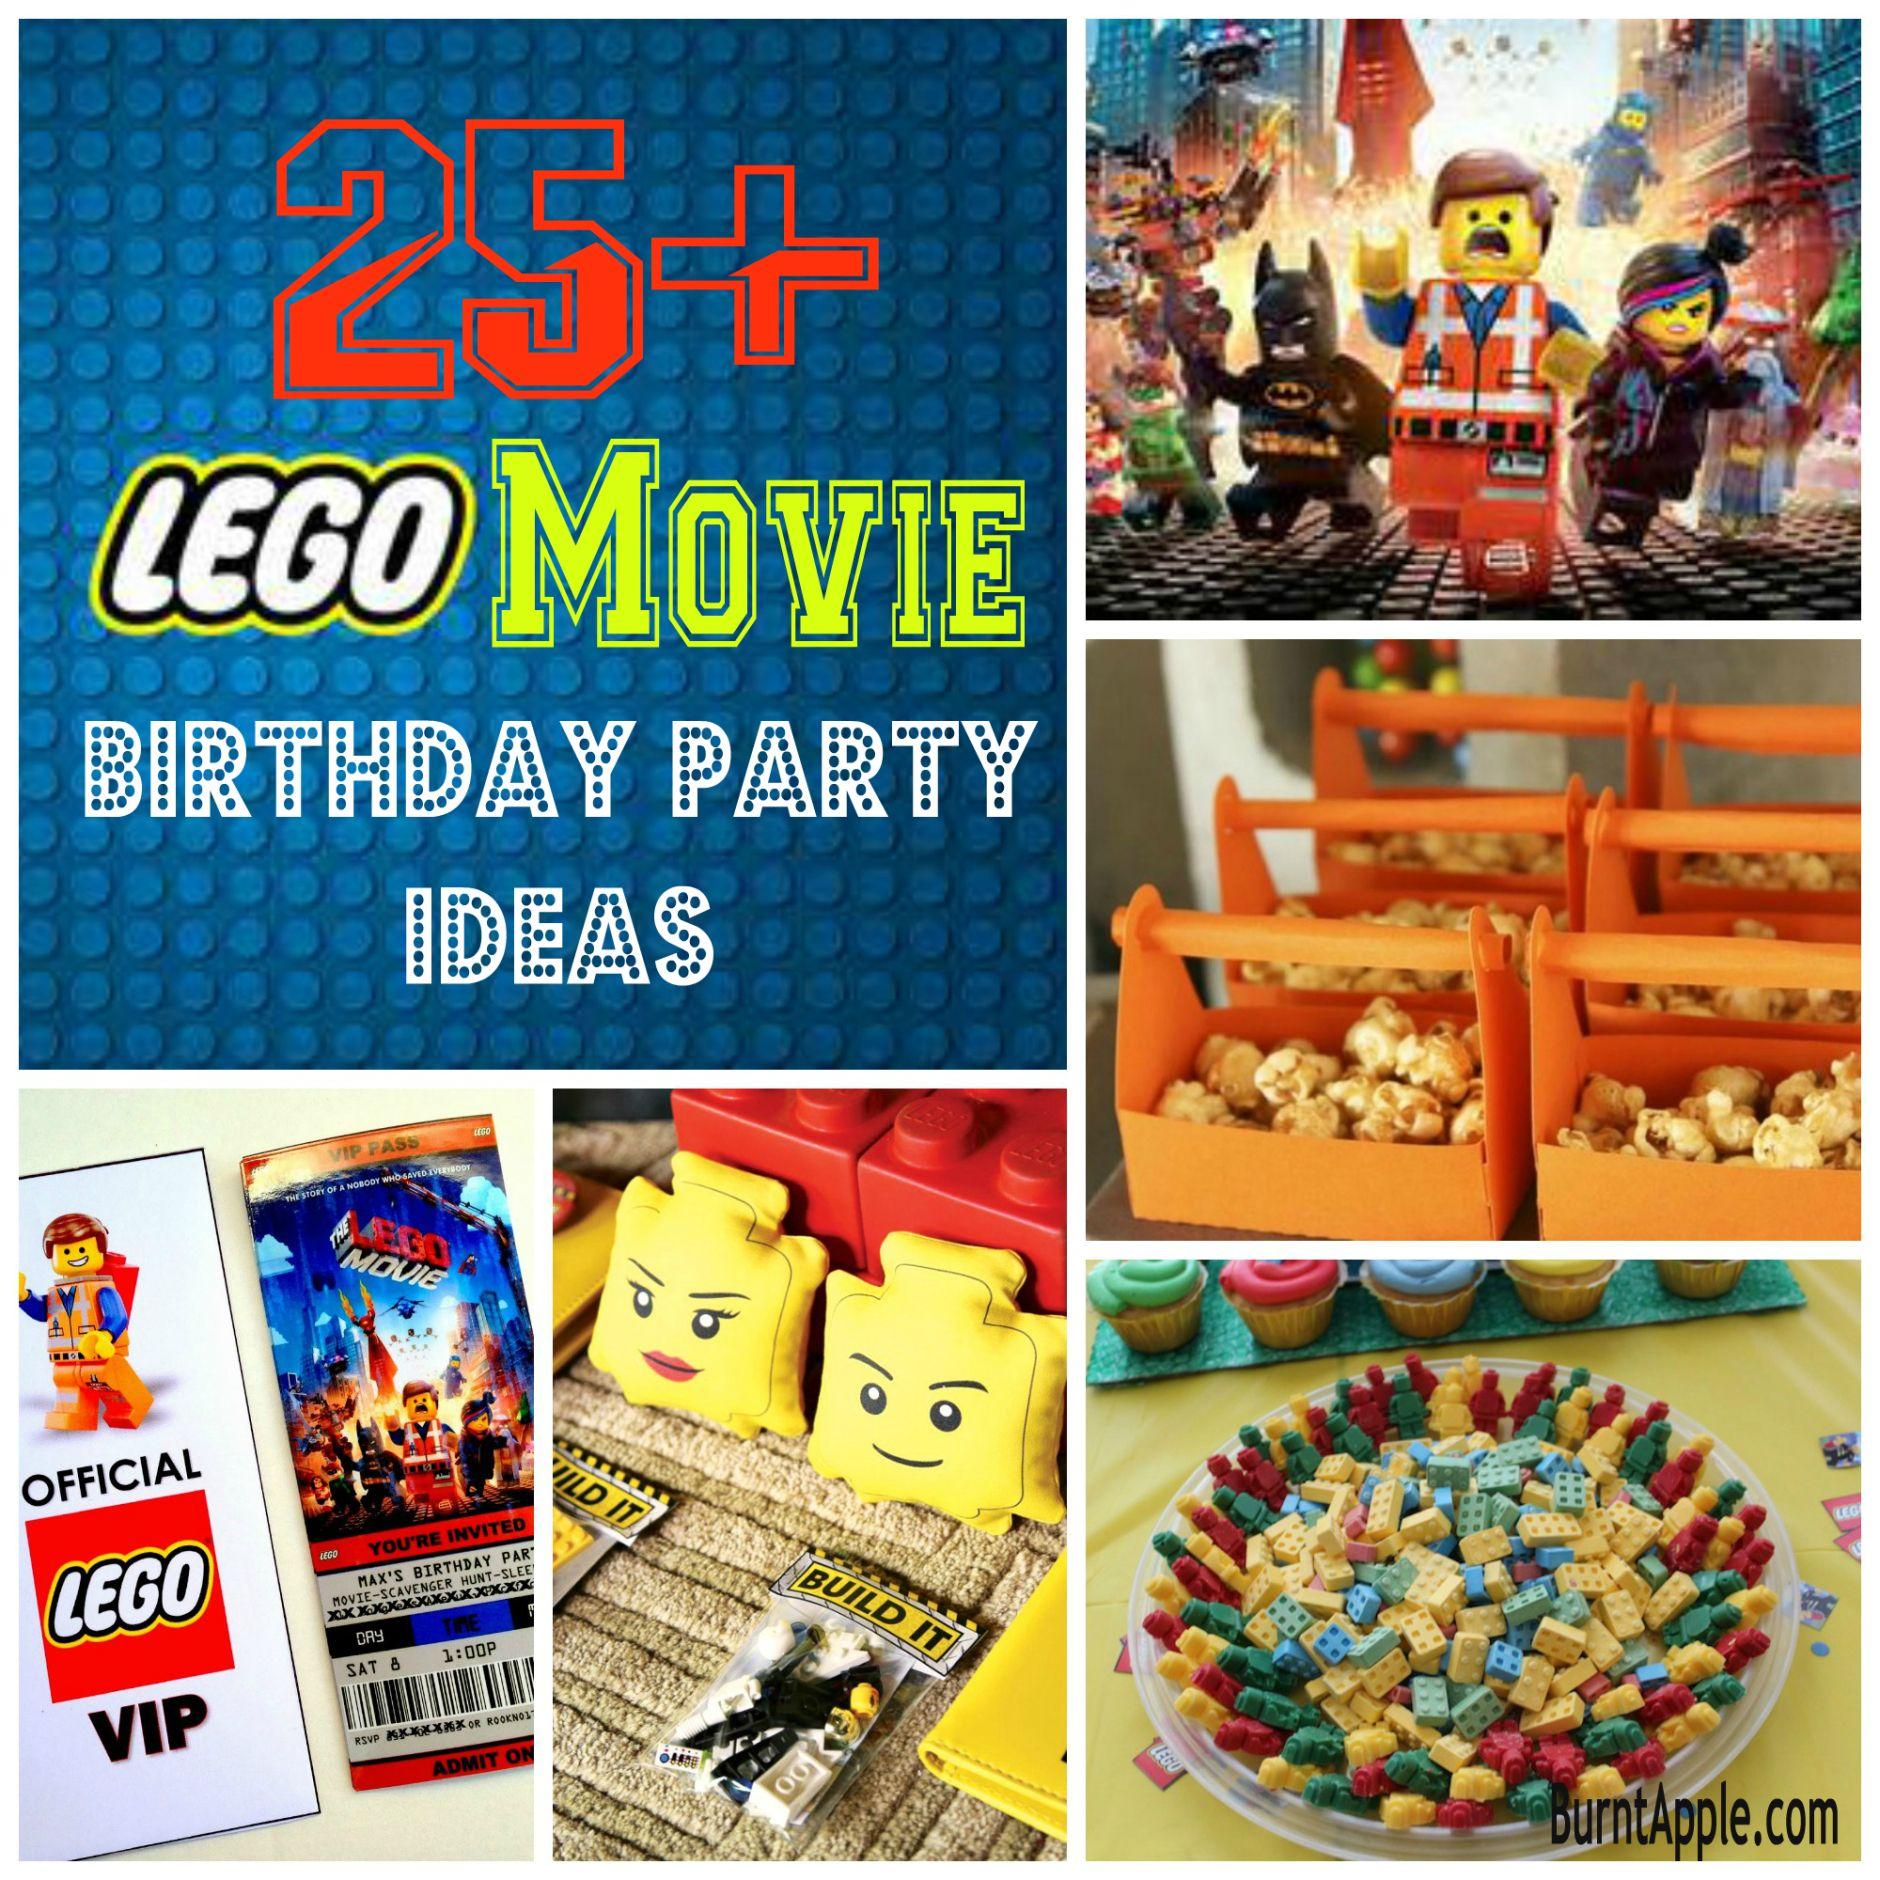 25 Lego Movie Birthday Party Ideas Burnt Apple Lego Movie Birthday Movie Birthday Party Lego Themed Party